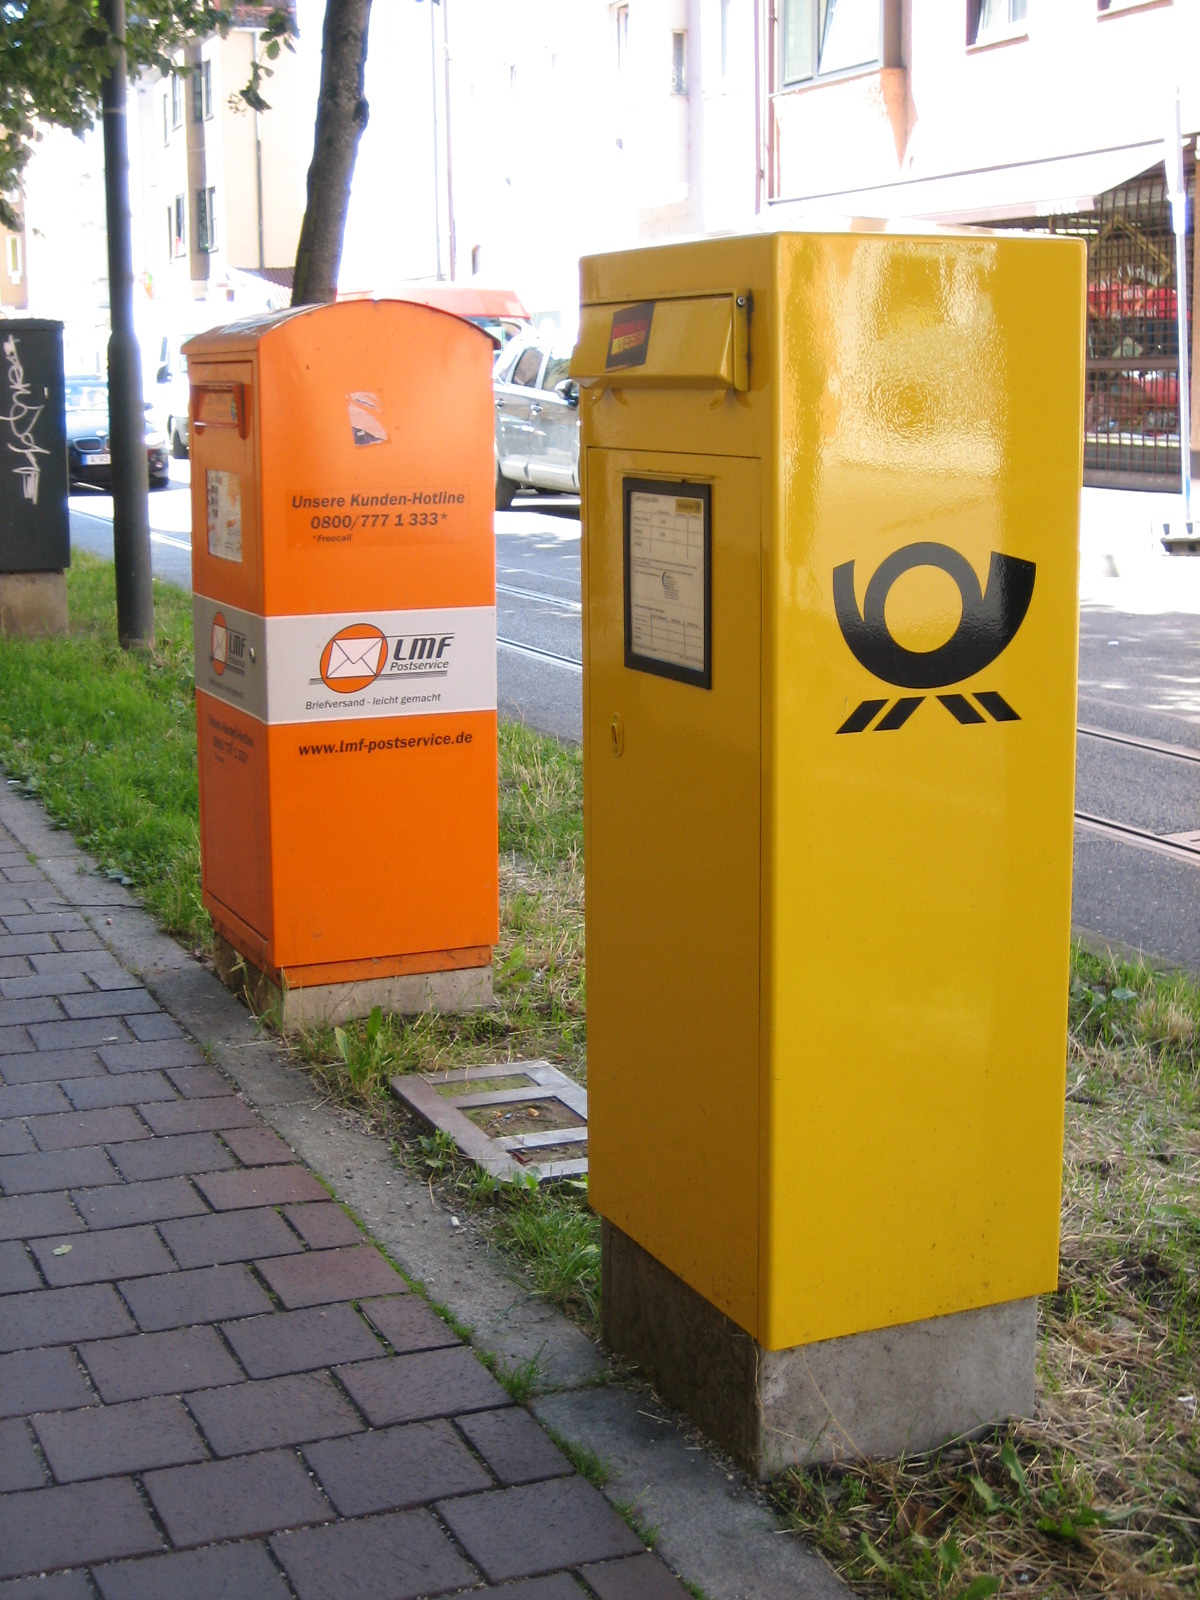 File augsburg wikimedia commons - Buzon de correos ...